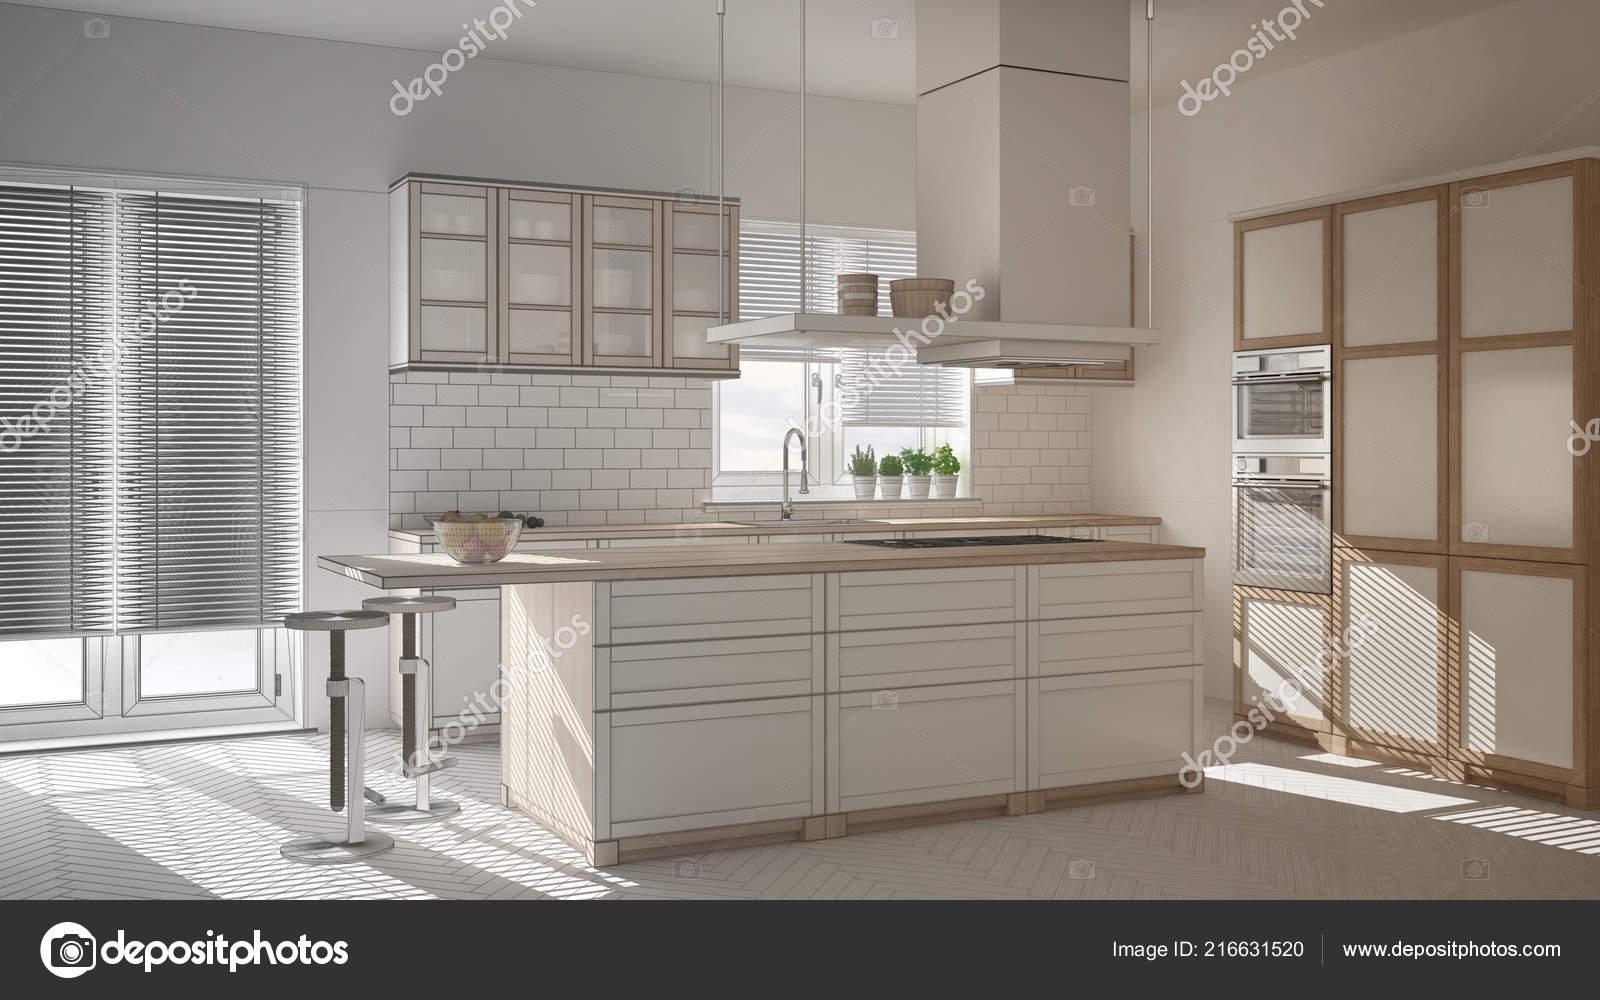 islands for the kitchen large round table sets 未完成的项目的现代木白色厨房与岛屿凳子和窗户镶木人字地板 图库照片 未完成的项目的现代木白色厨房与岛屿凳子和窗户镶木